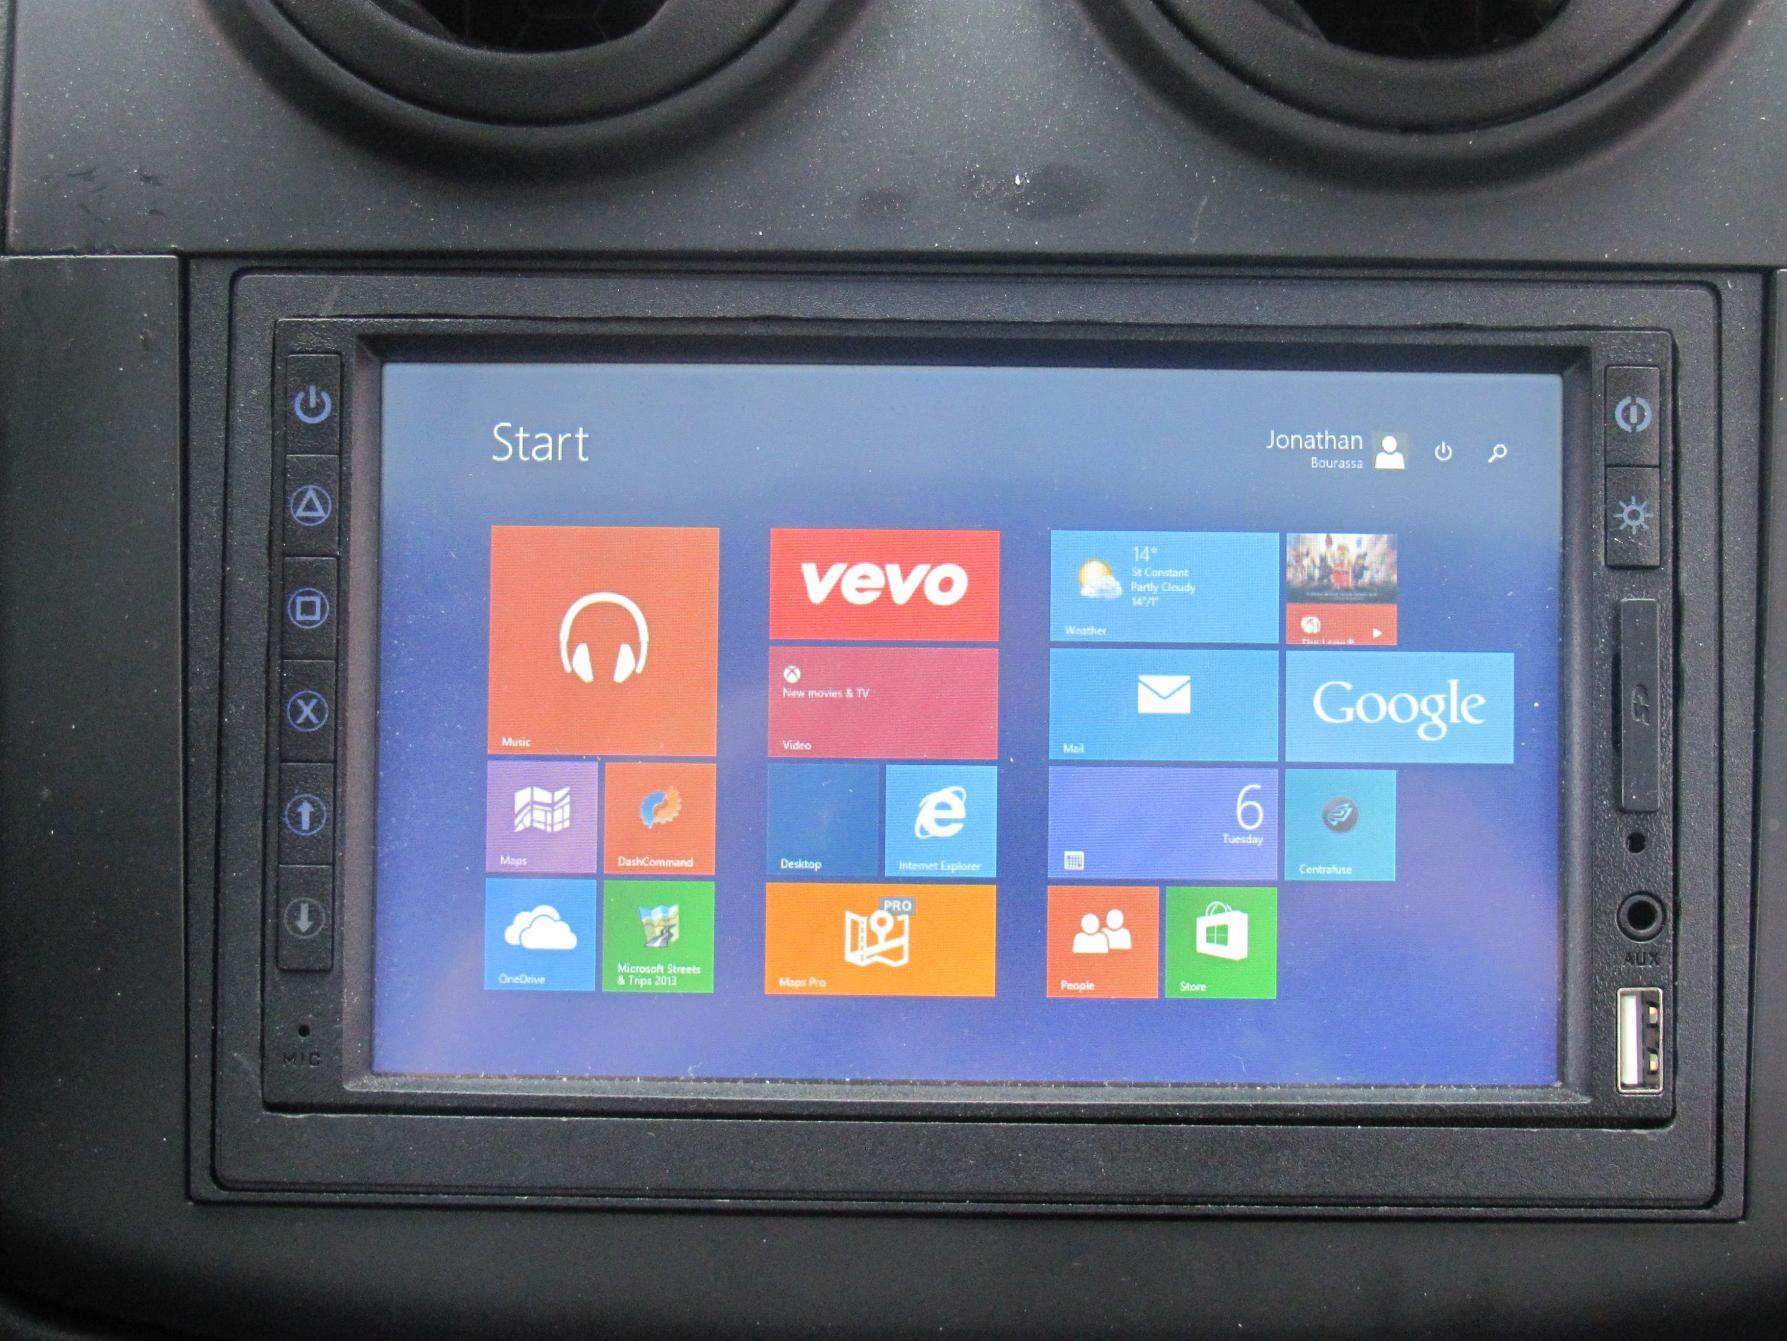 Car Backup Camera >> Windows 8.1 Car-PC Replacing the Head Unit